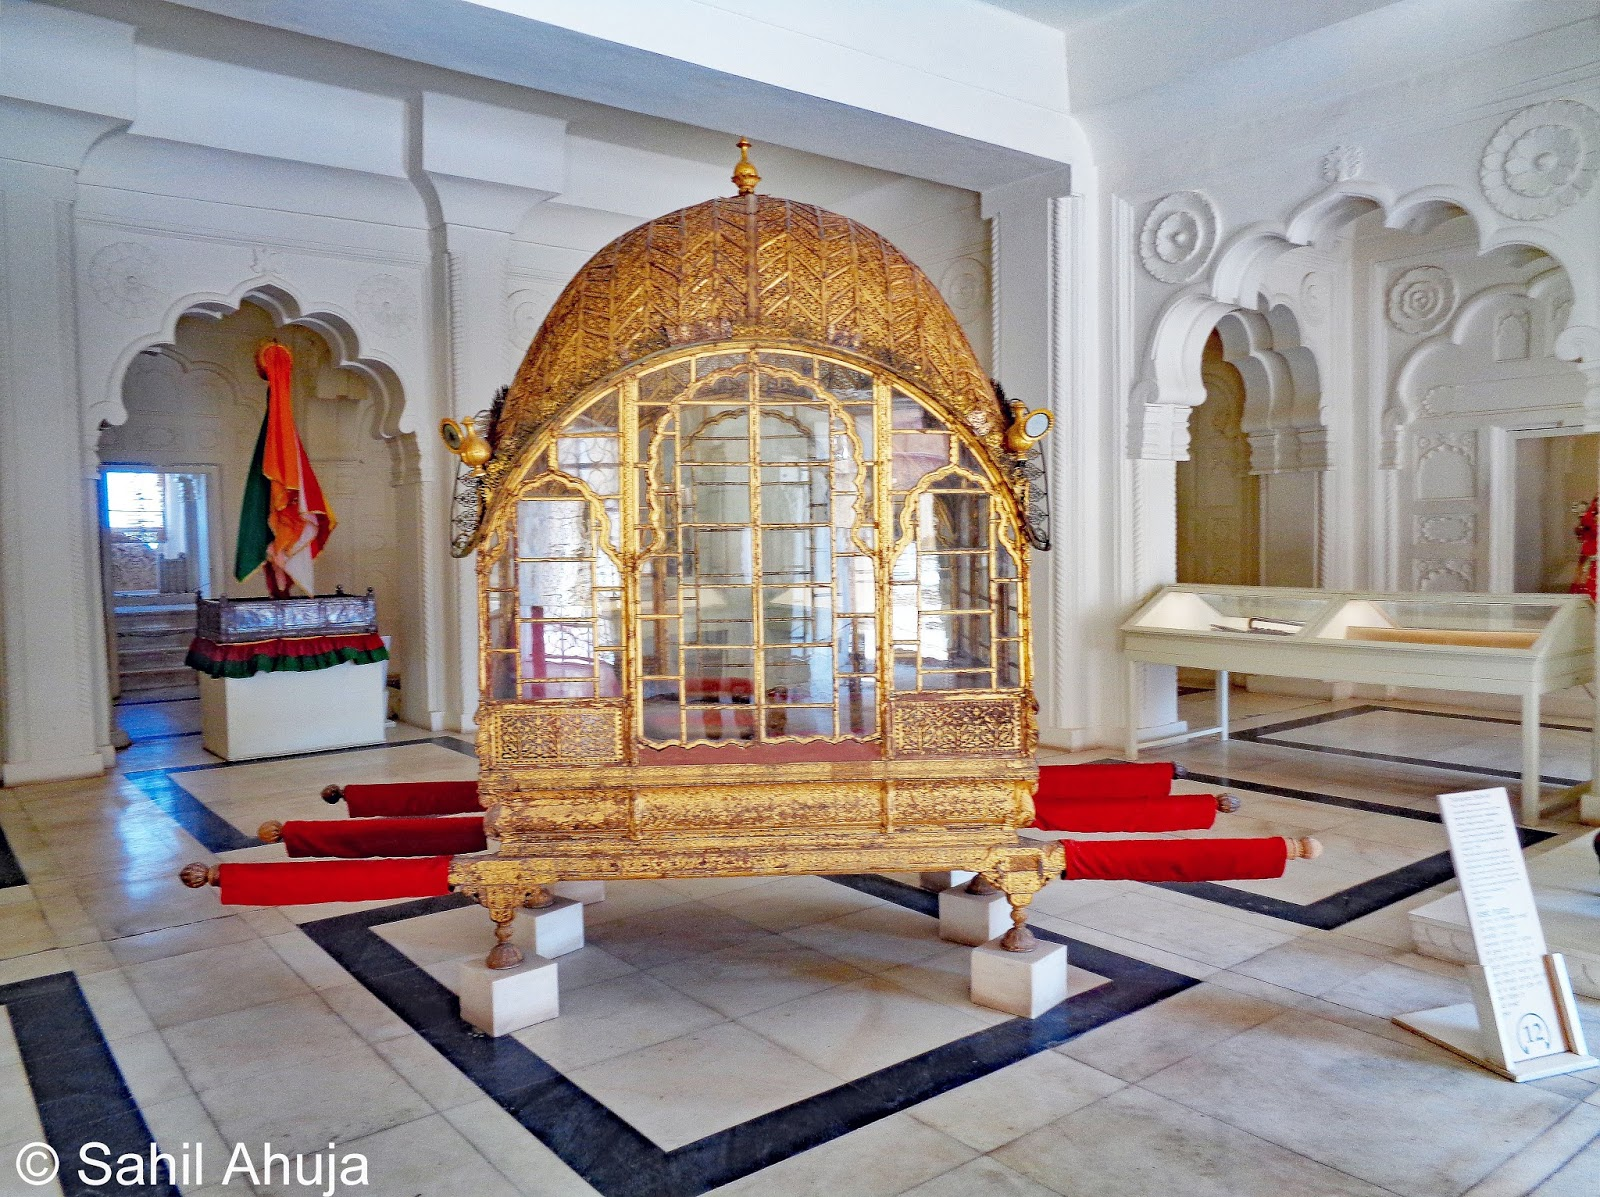 still fit for royalty mahadol daulat khana mahal museum - Pixelated Interior Design